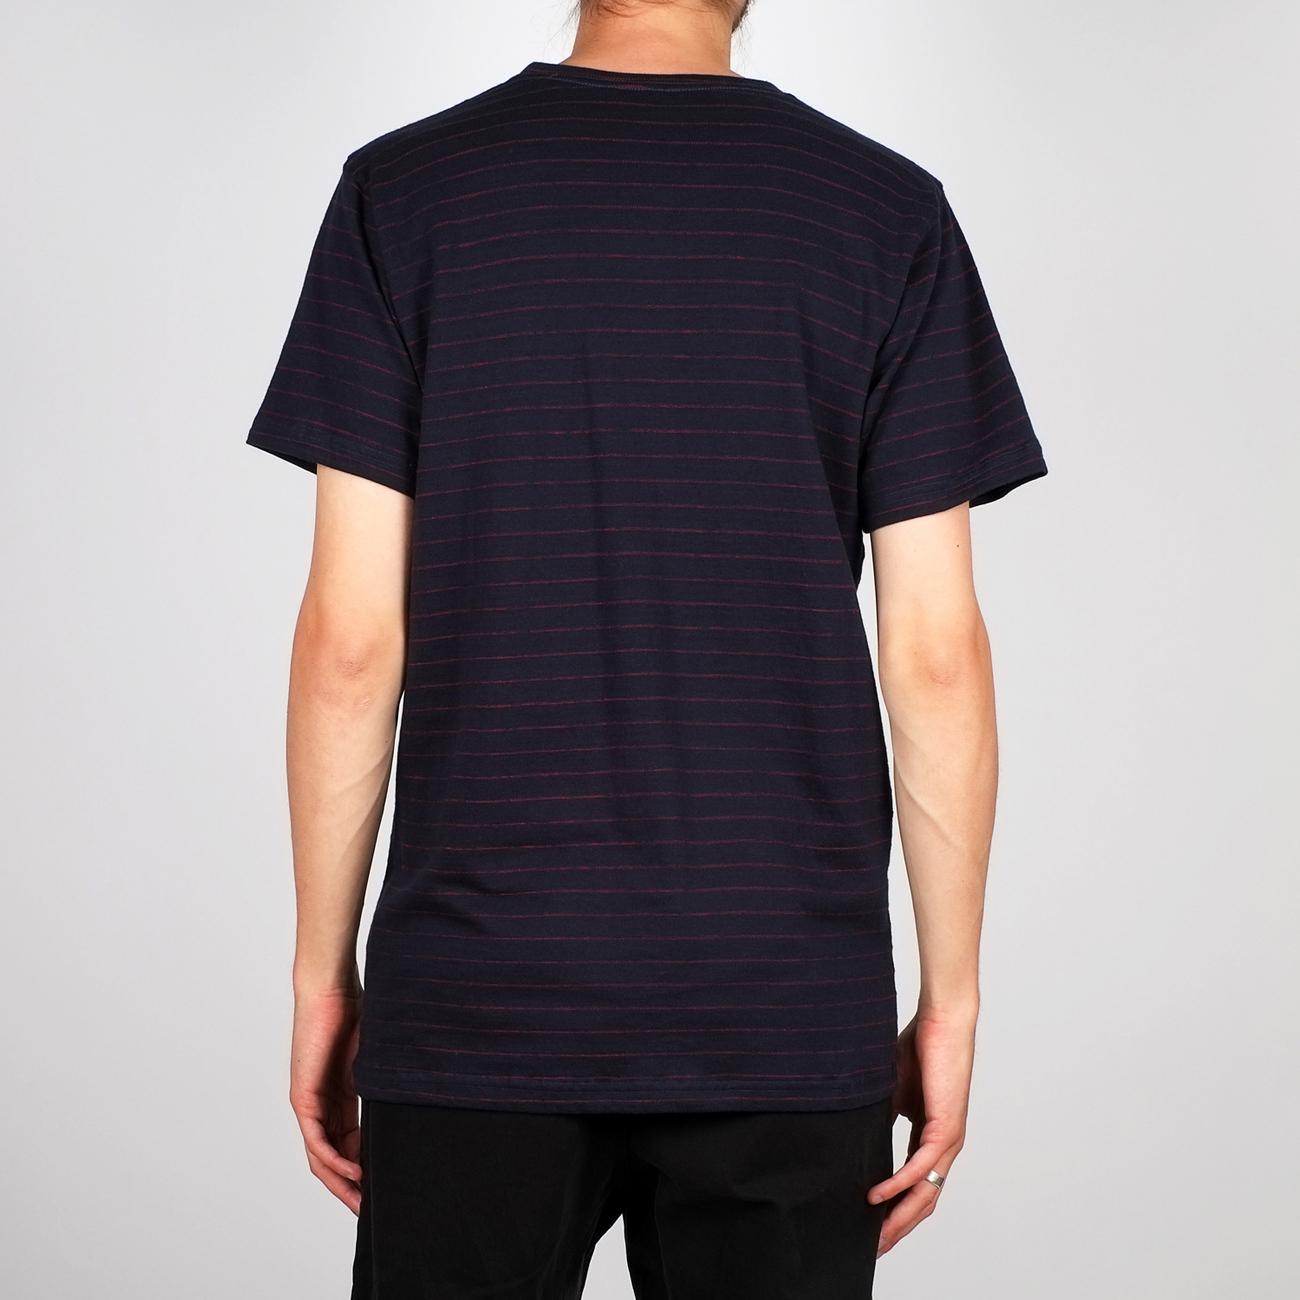 T-shirt Stockholm Jacquard Stripes Navy